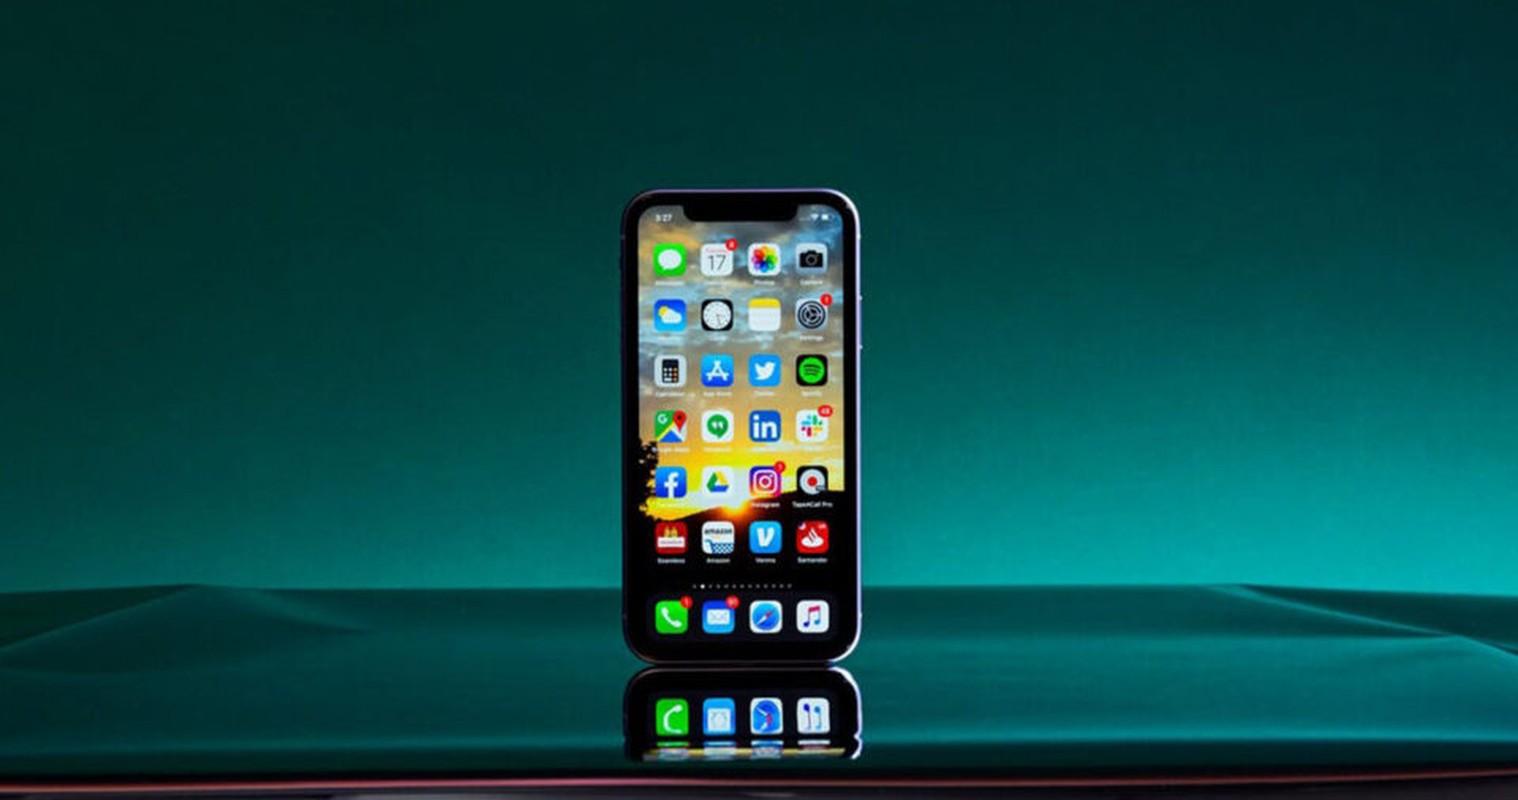 iPhone mini nho nhat tu truoc den nay xuat hien cung iPhone 12-Hinh-8